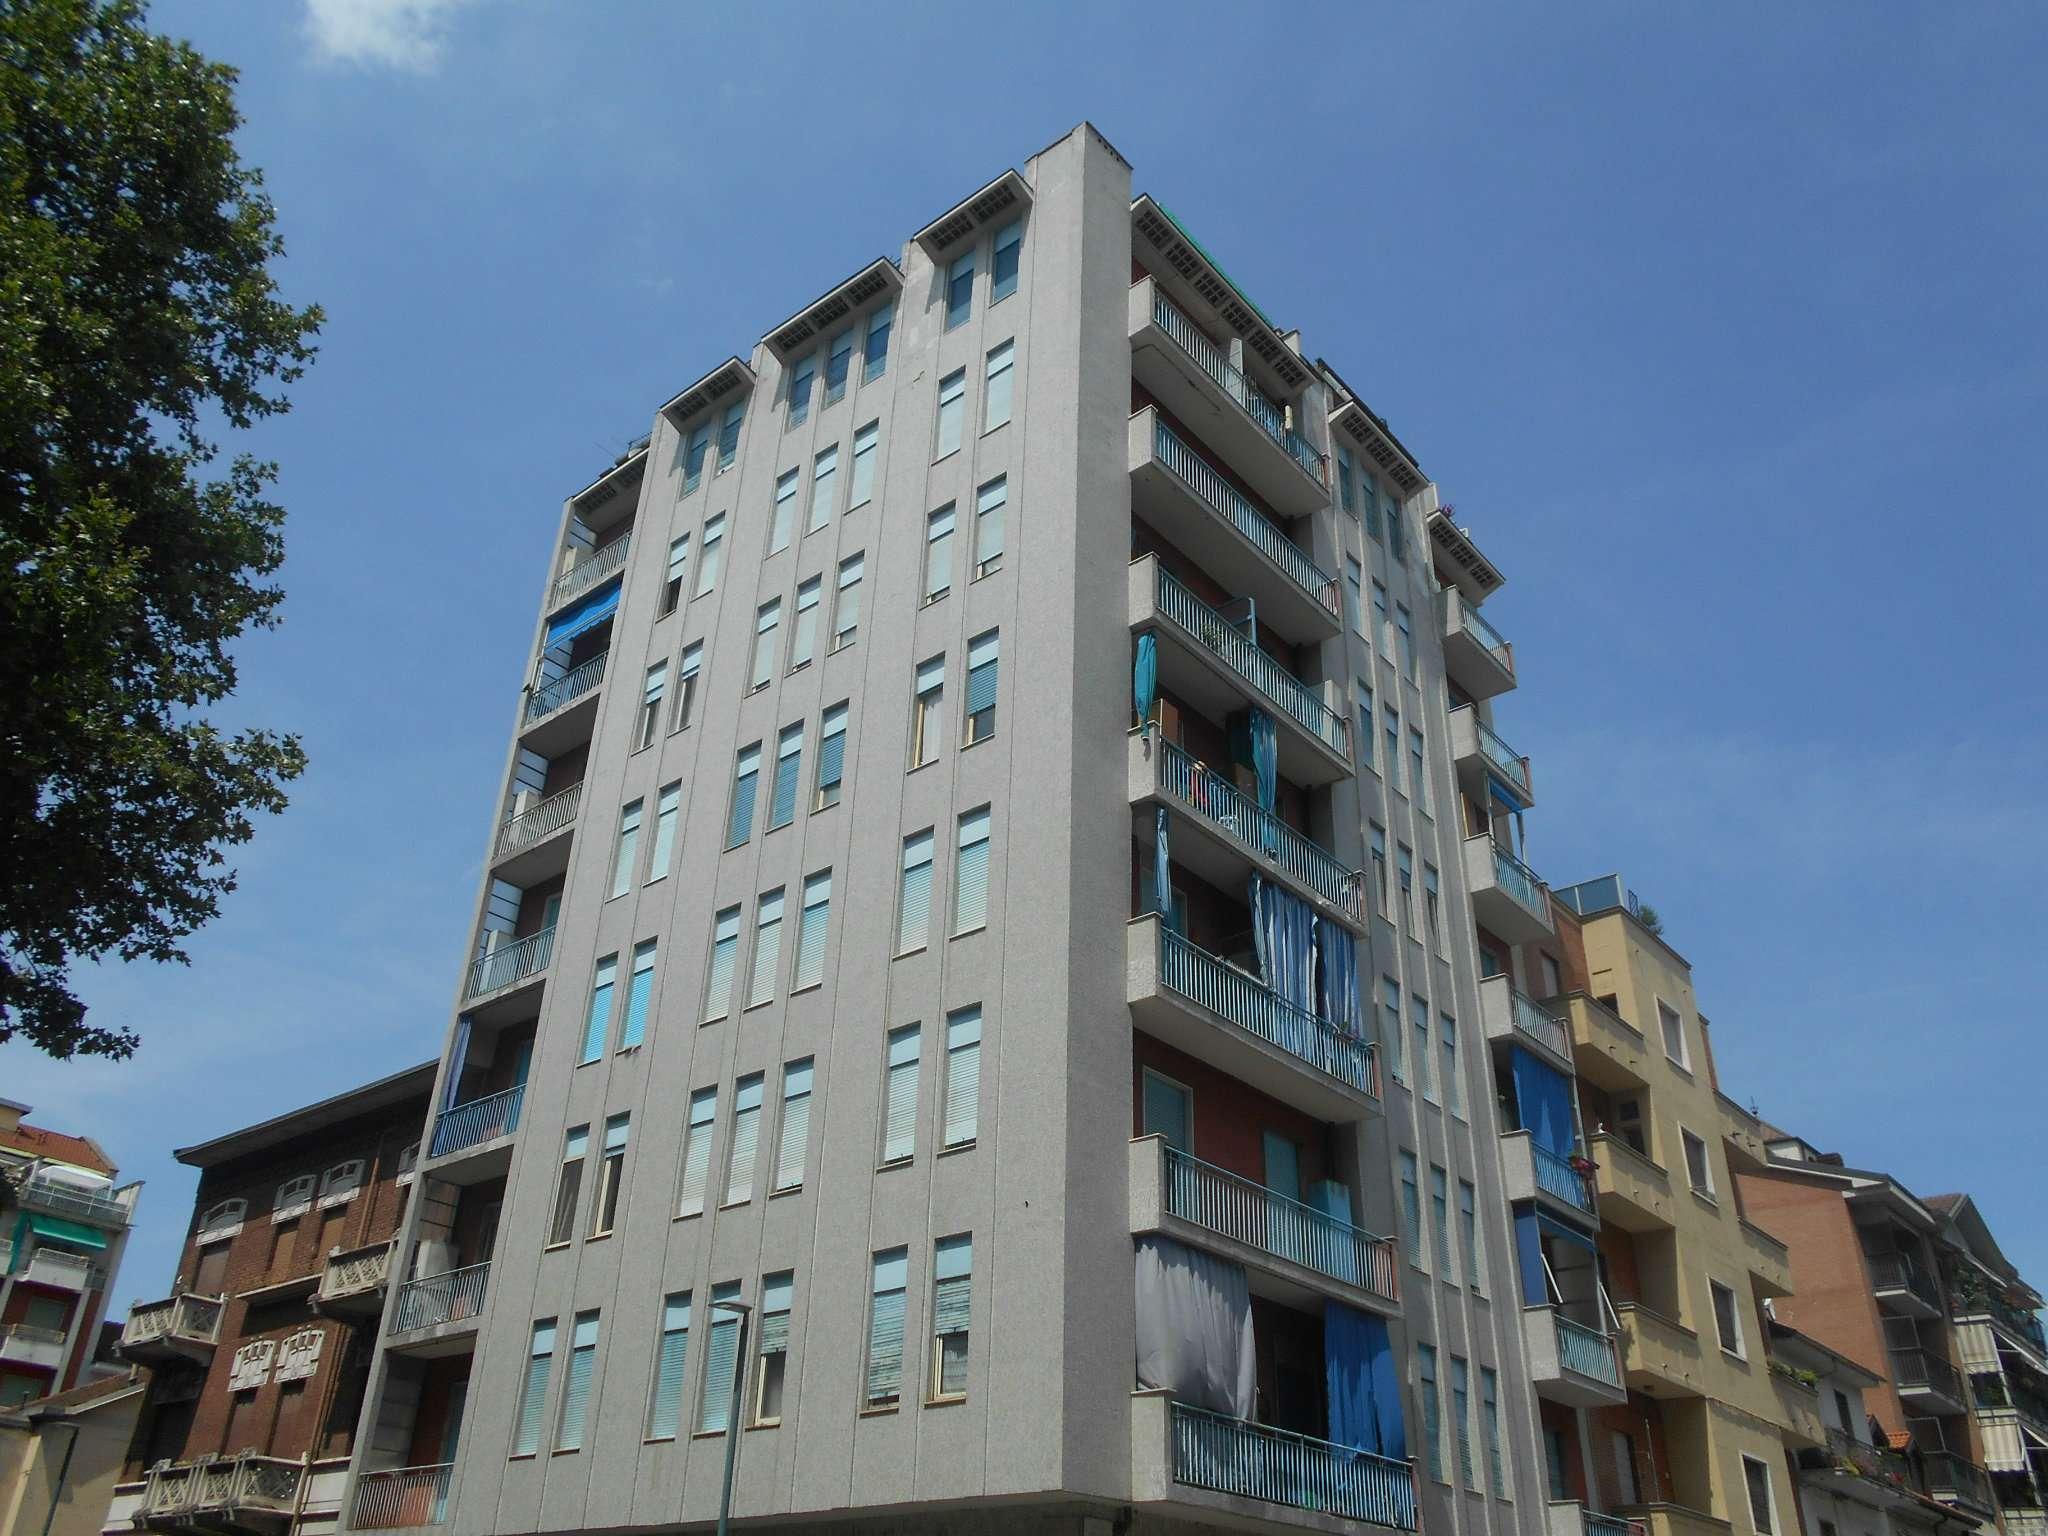 Appartamento in affitto Zona Barriera Milano, Falchera, Barca-Be... - corso NOVARA Torino